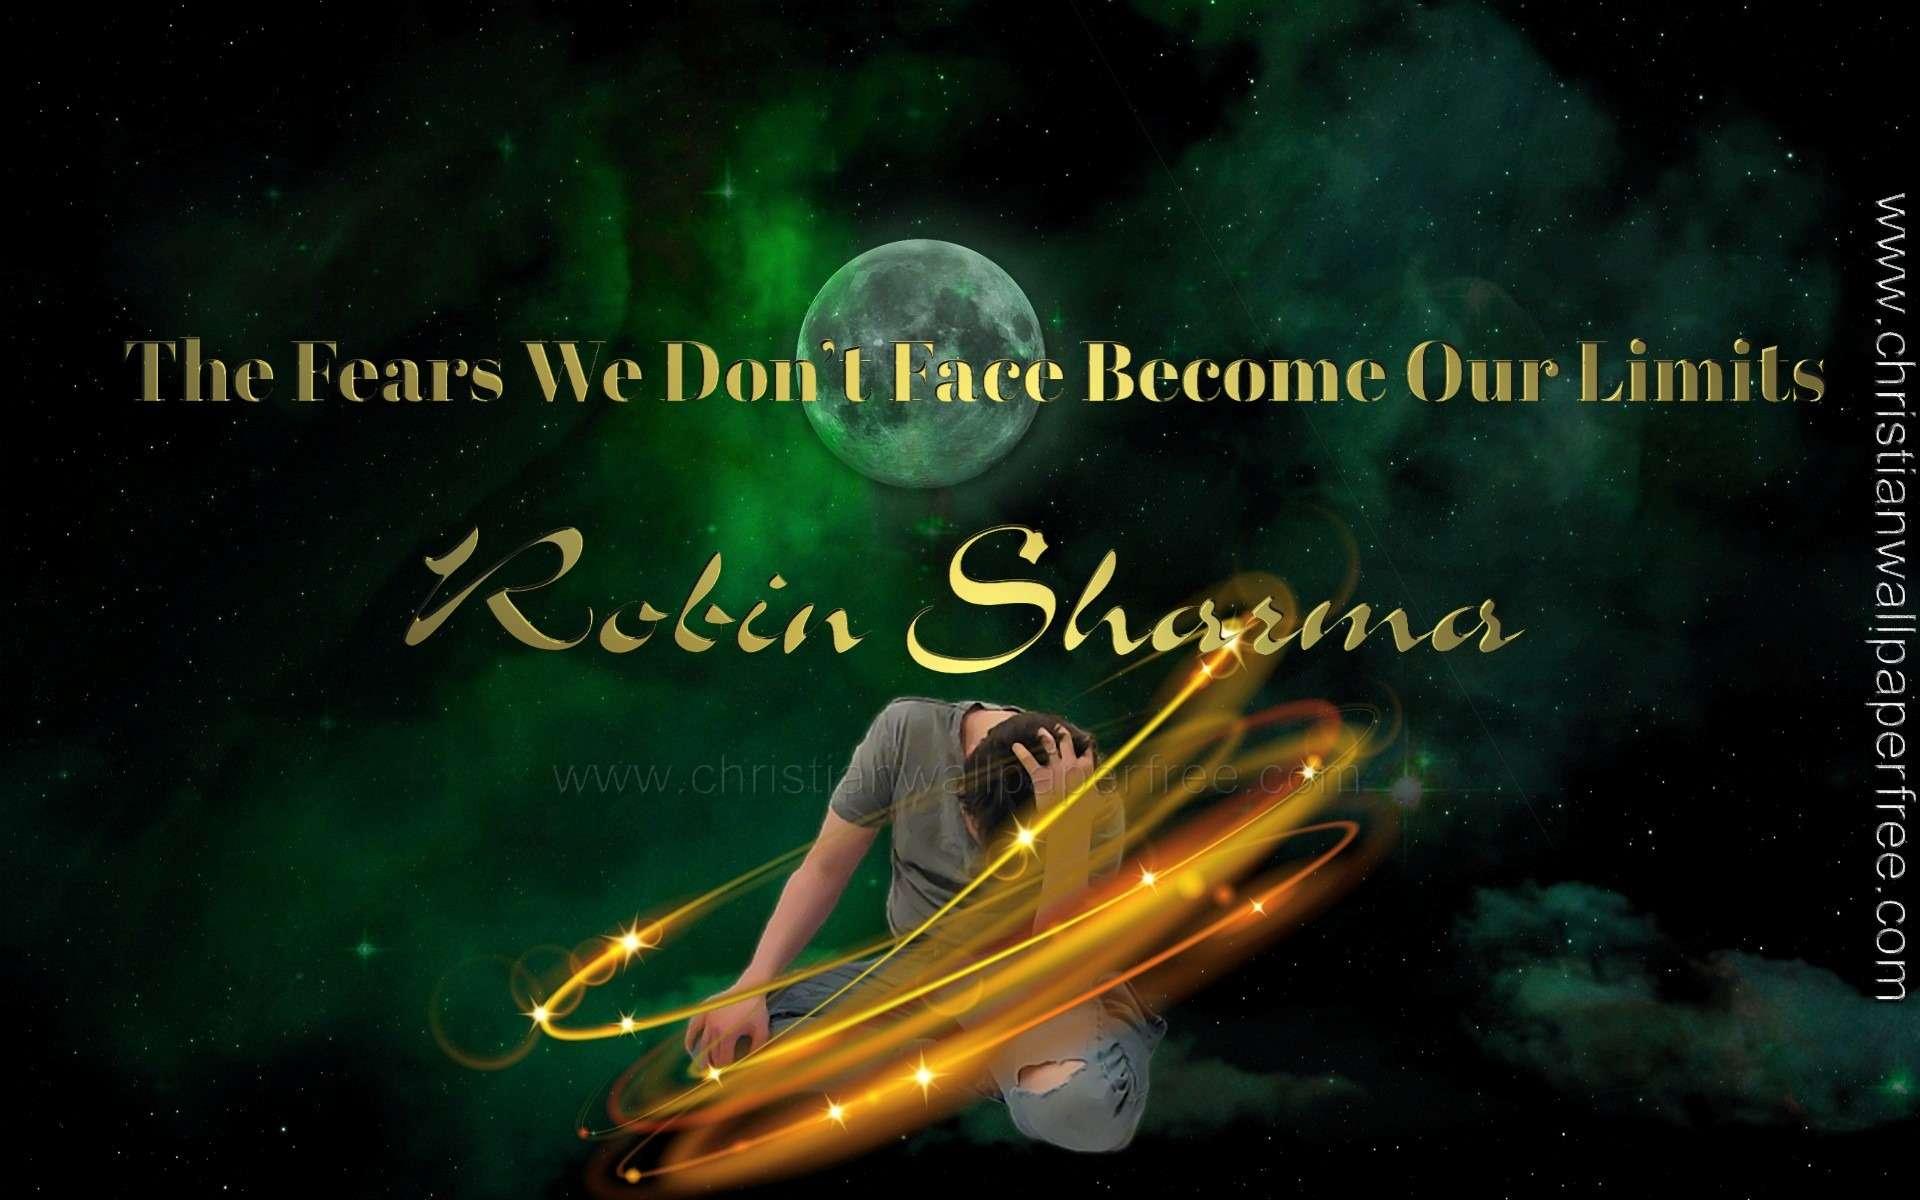 The Fears We Dont Face Robin Sharma